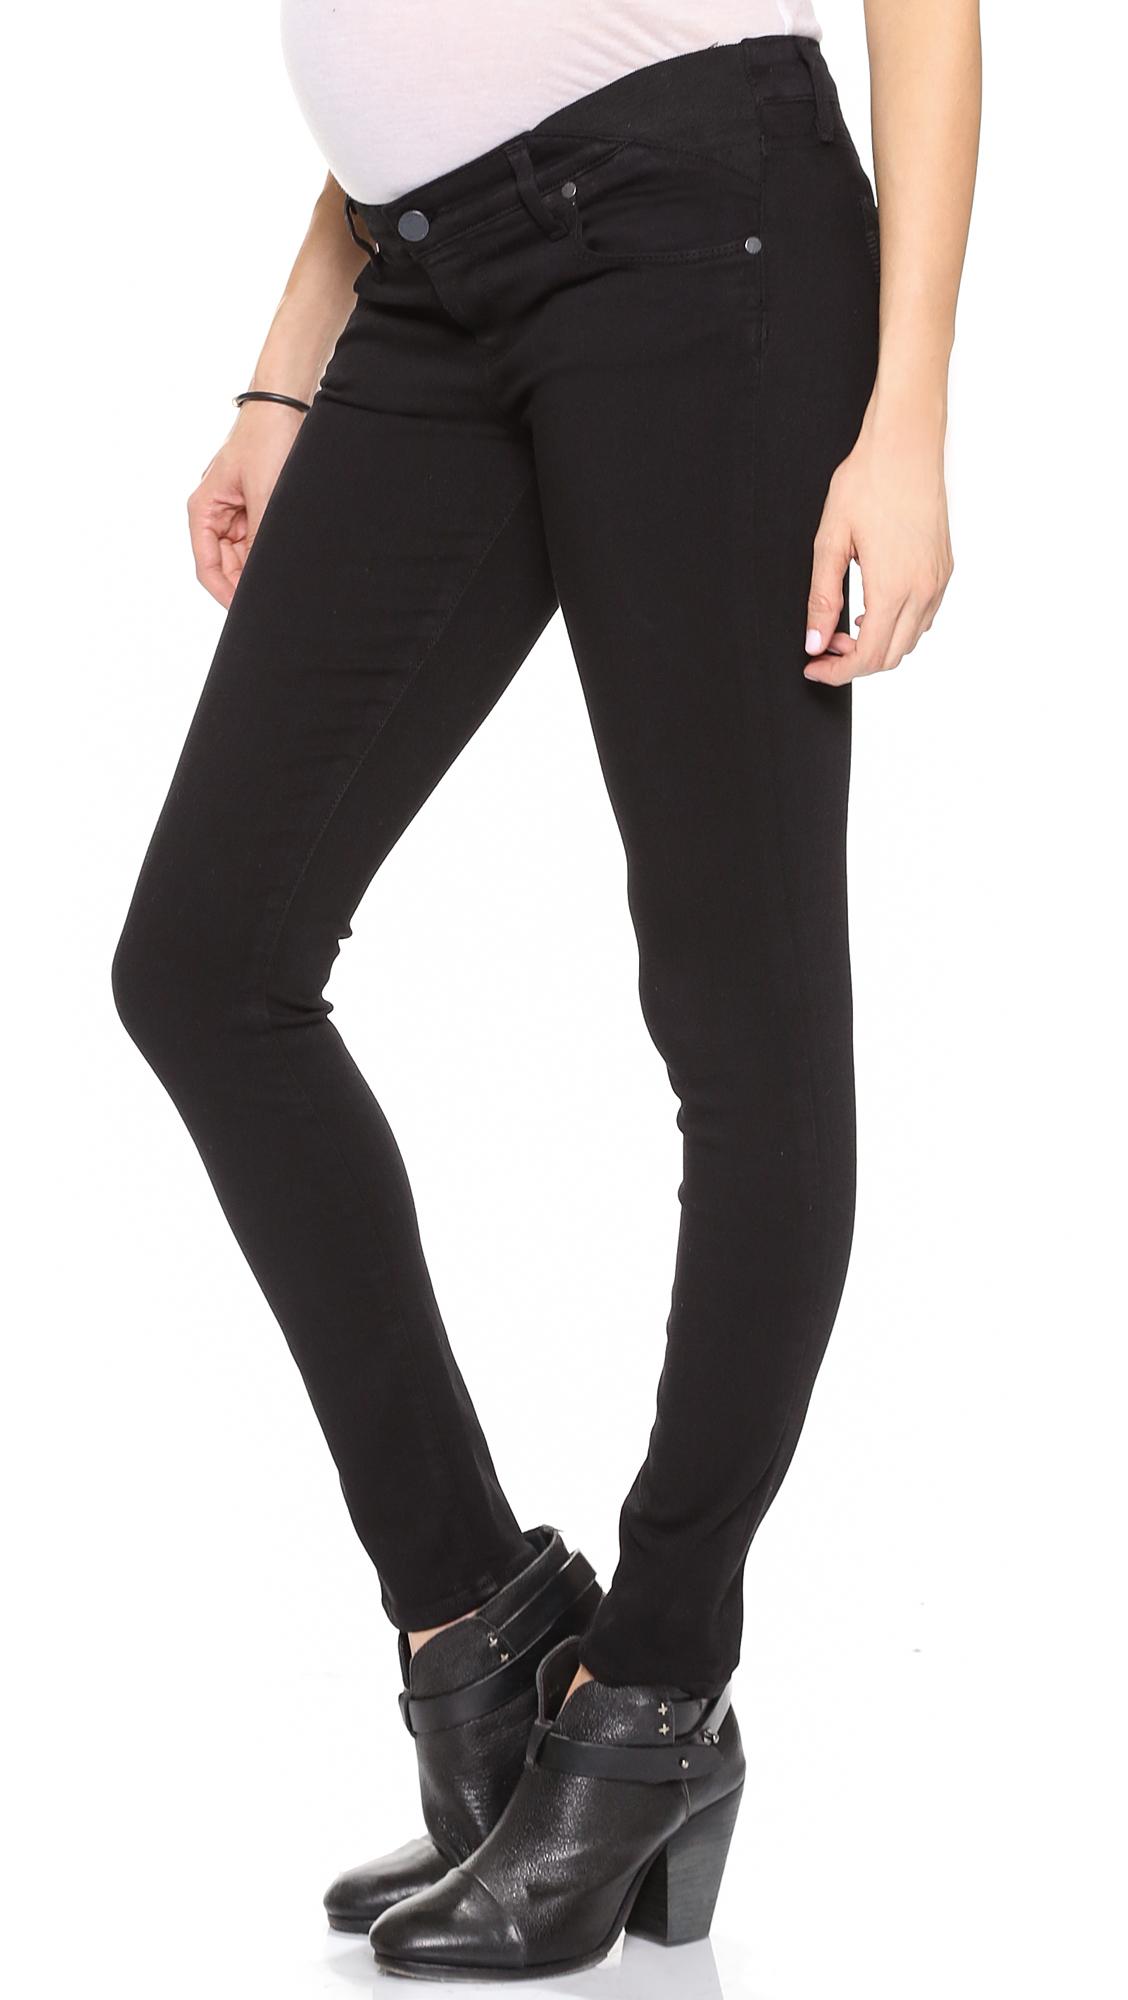 Paige Verdugo Ultra Skinny Maternity Jeans - Black Overdye in ...